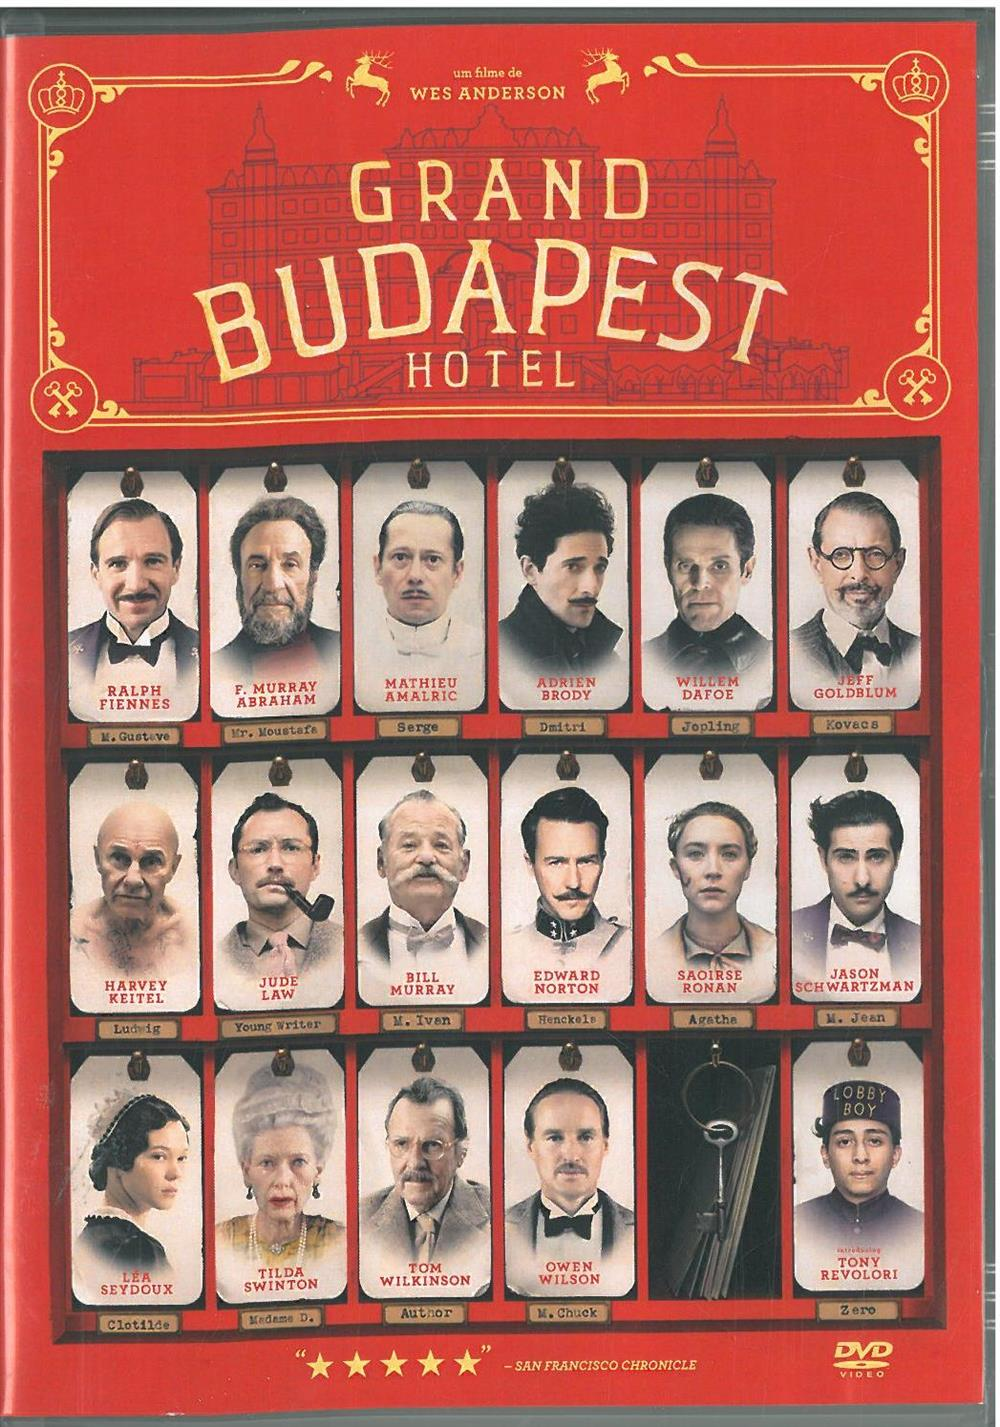 Grand Budapest hotel_DVD.jpg